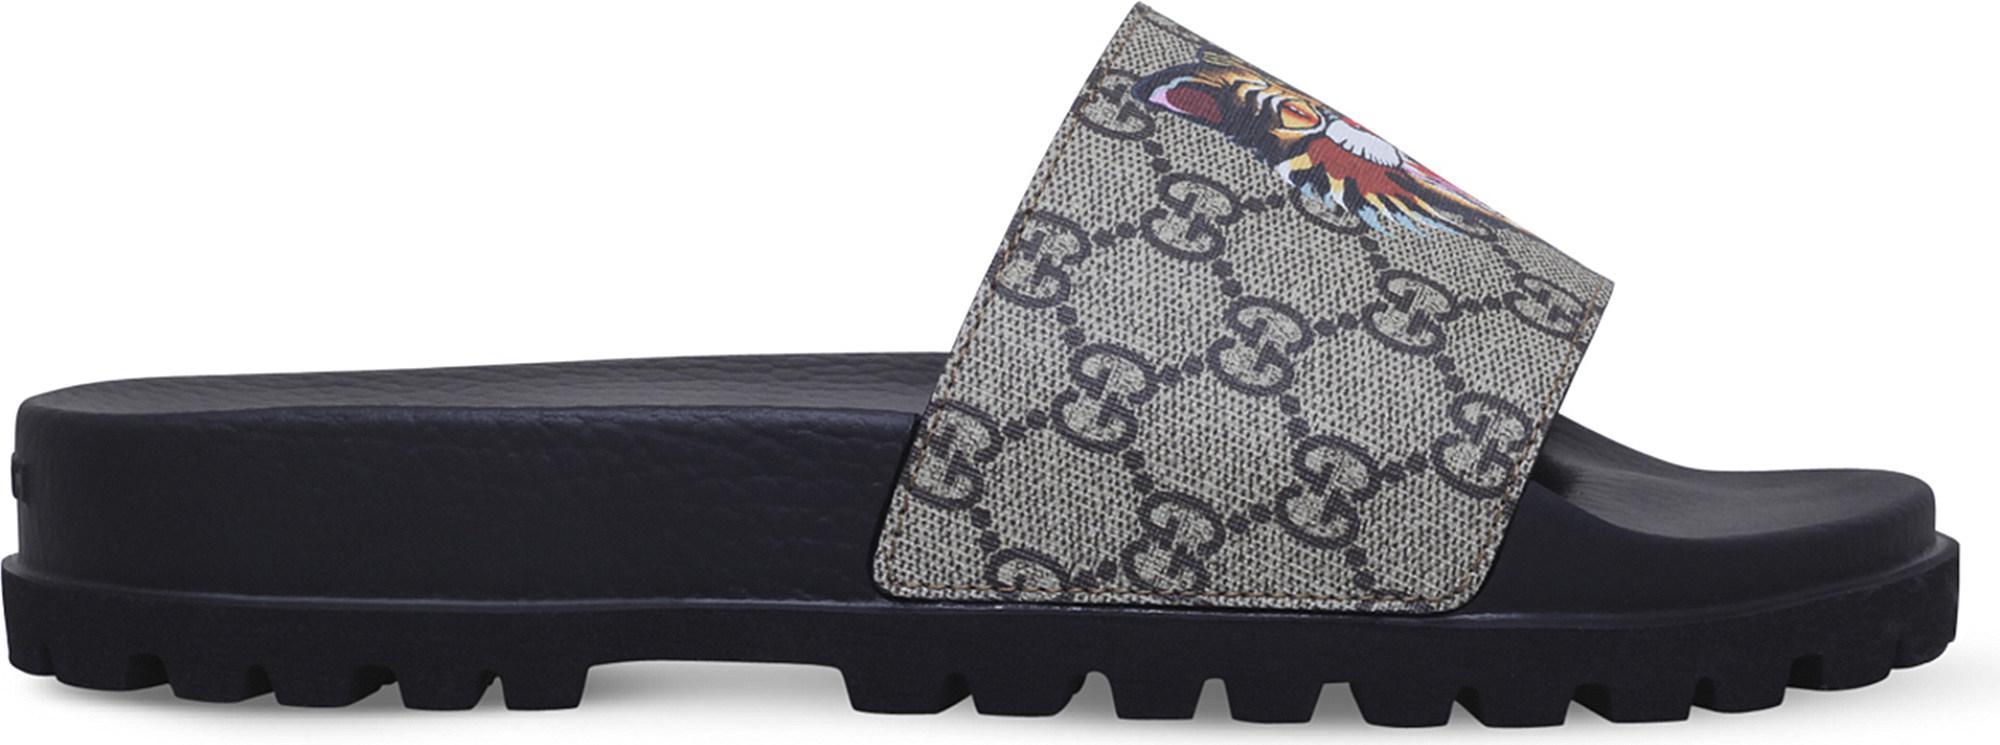 7b25e86b066ff Gucci Pursuit Cat-print Canvas Slider Sandals in Brown - Lyst